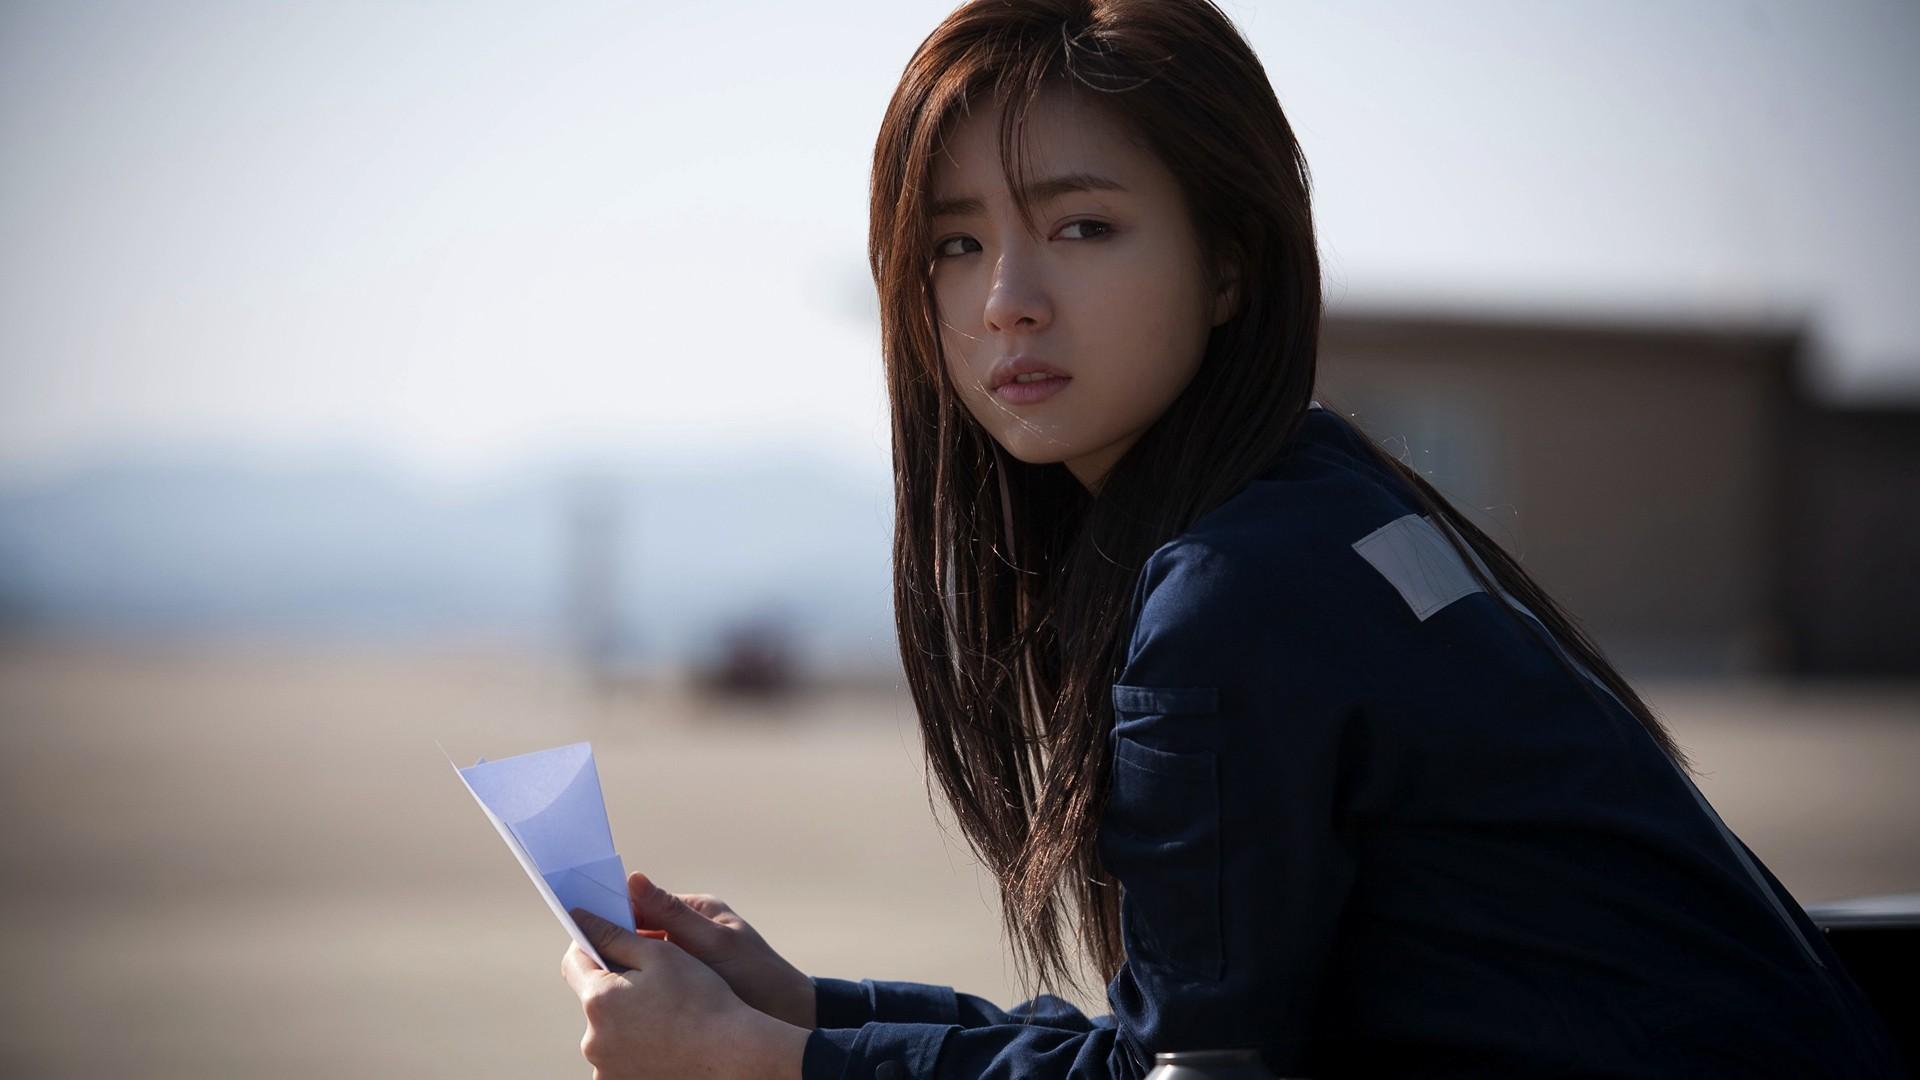 Asian hegirl movies, korean amateur nude shot